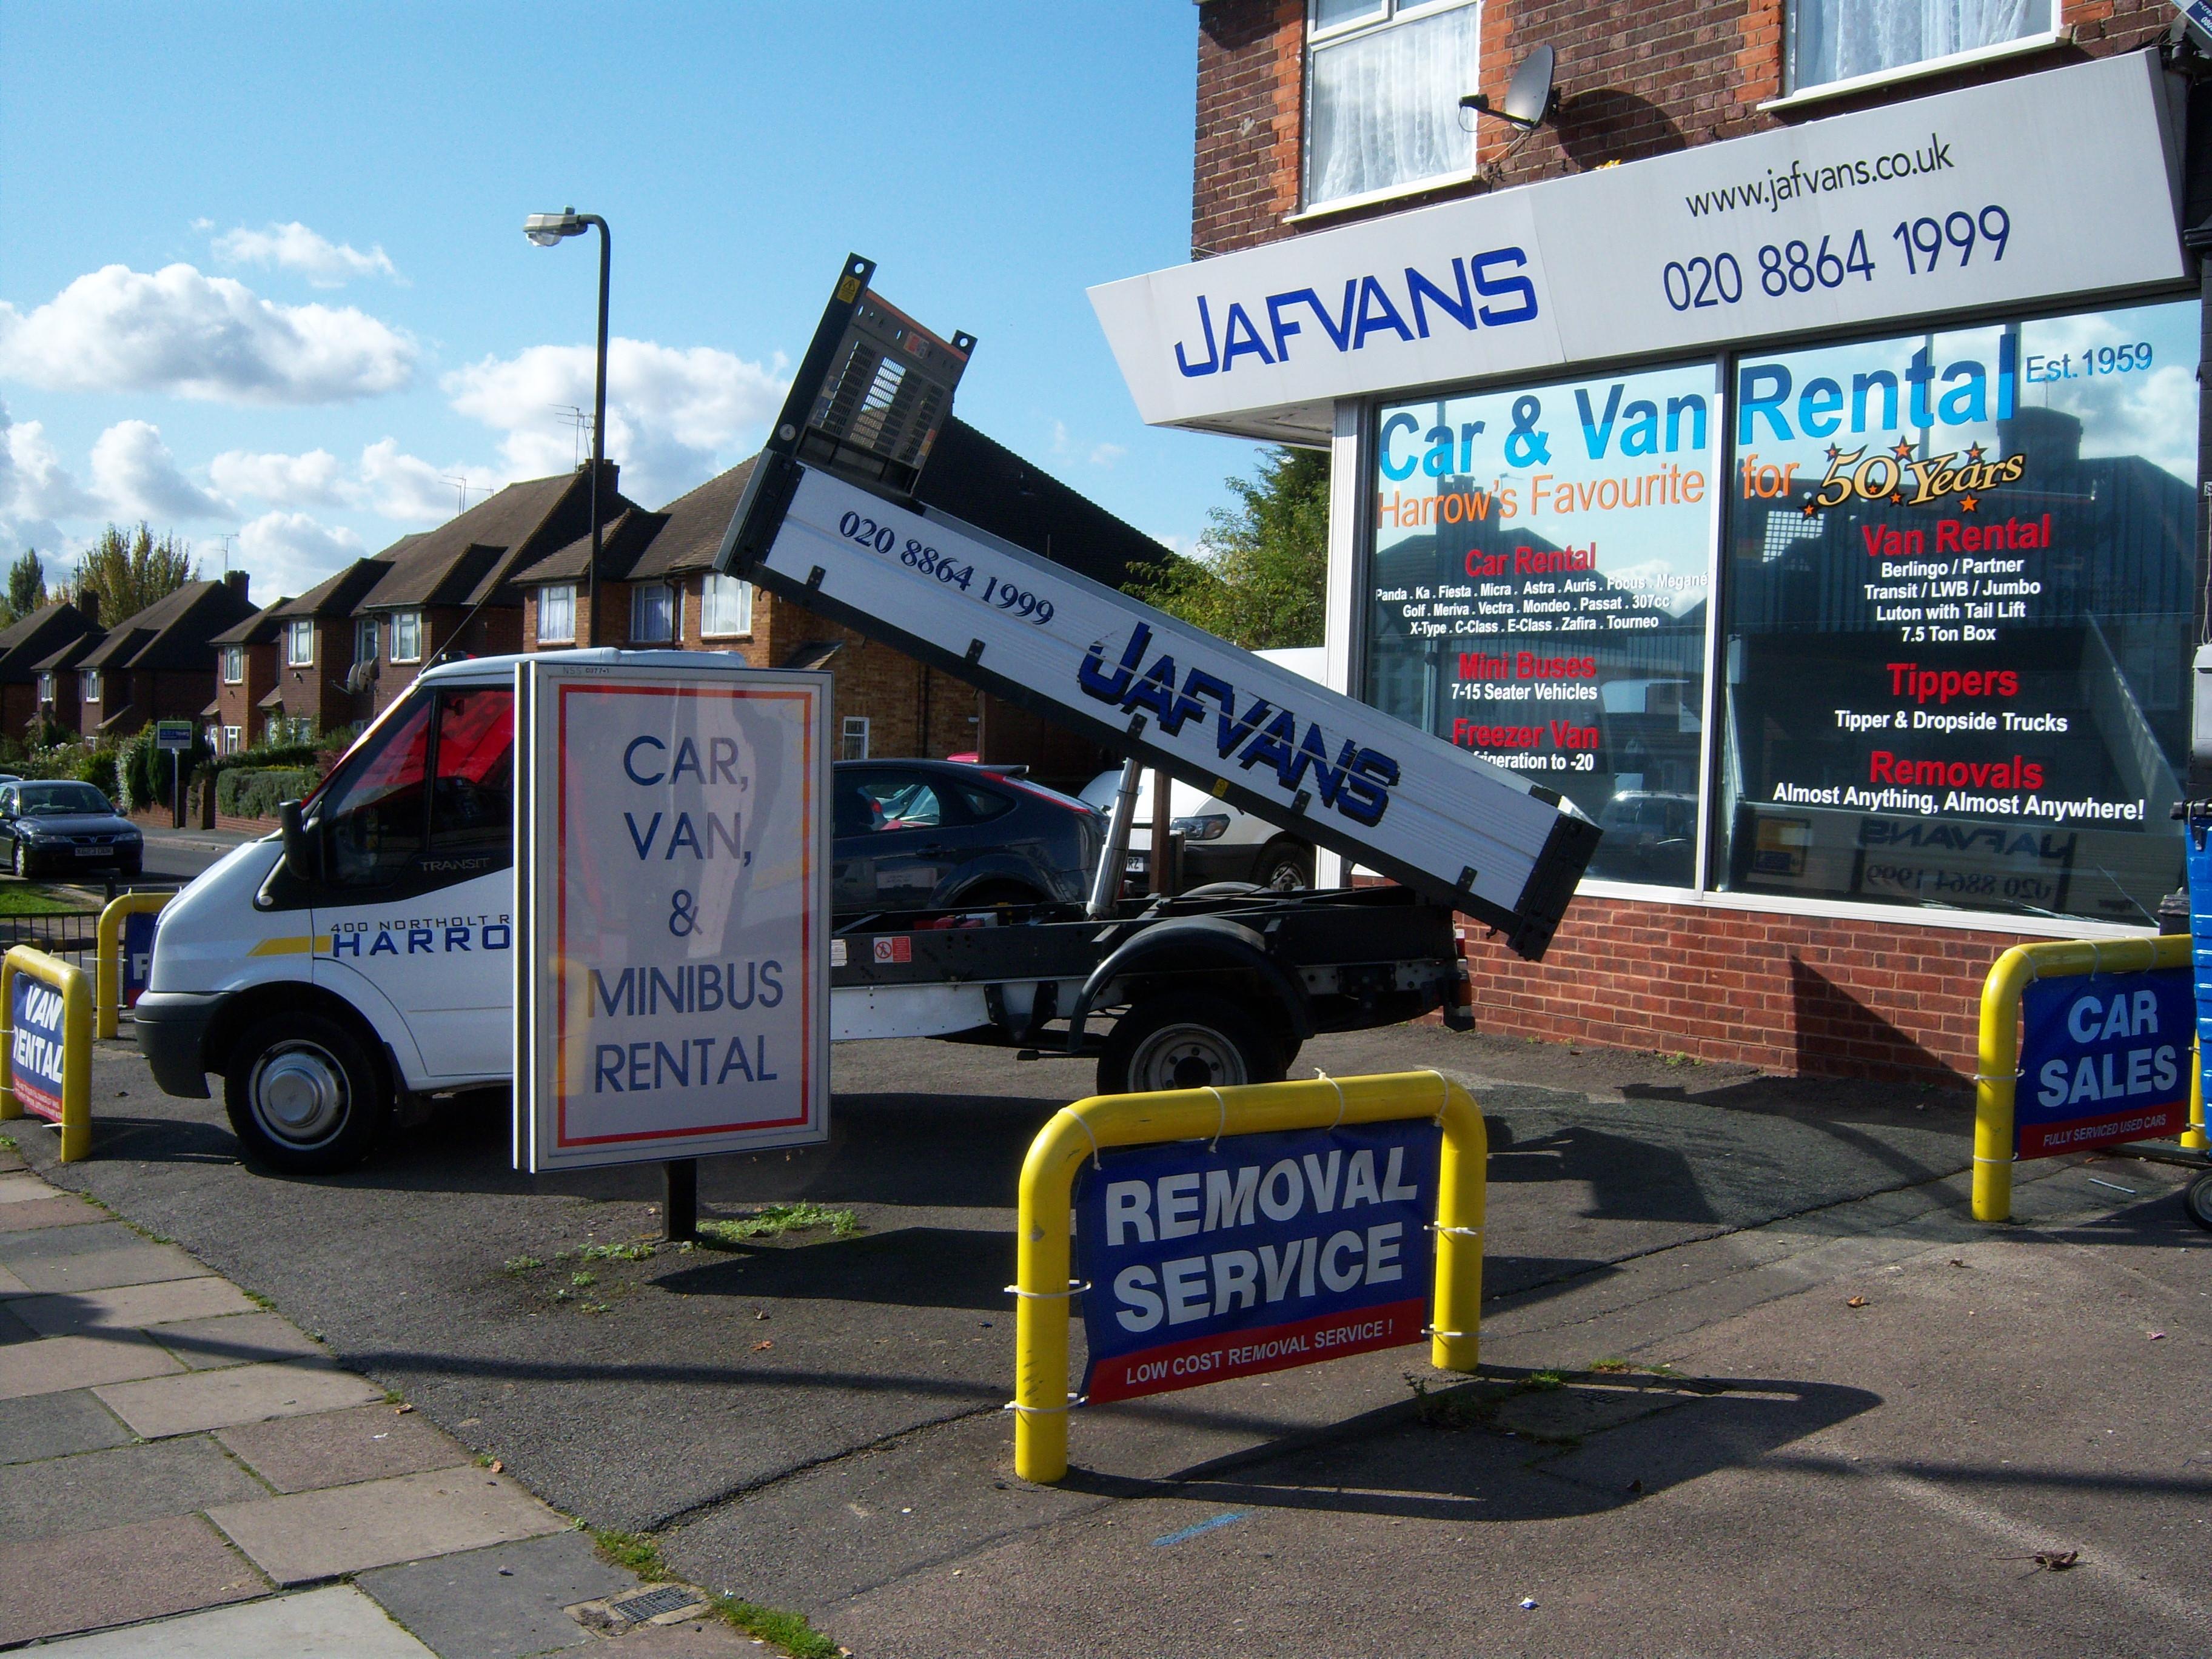 Jafvans Rentals Office in South Harrow